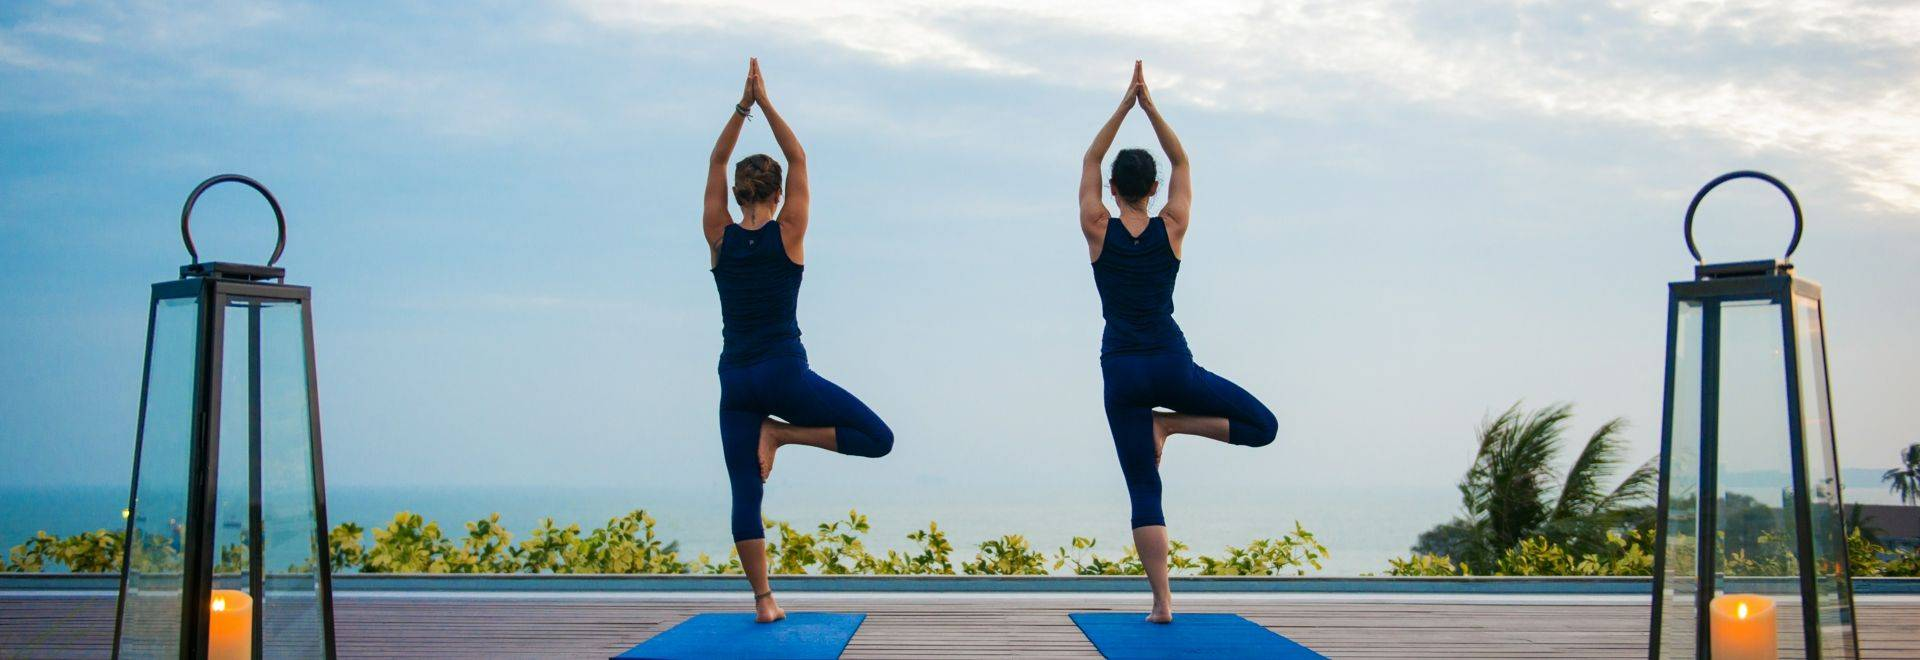 Amatara Wellness Resort   Yoga At Sun   Moon 01